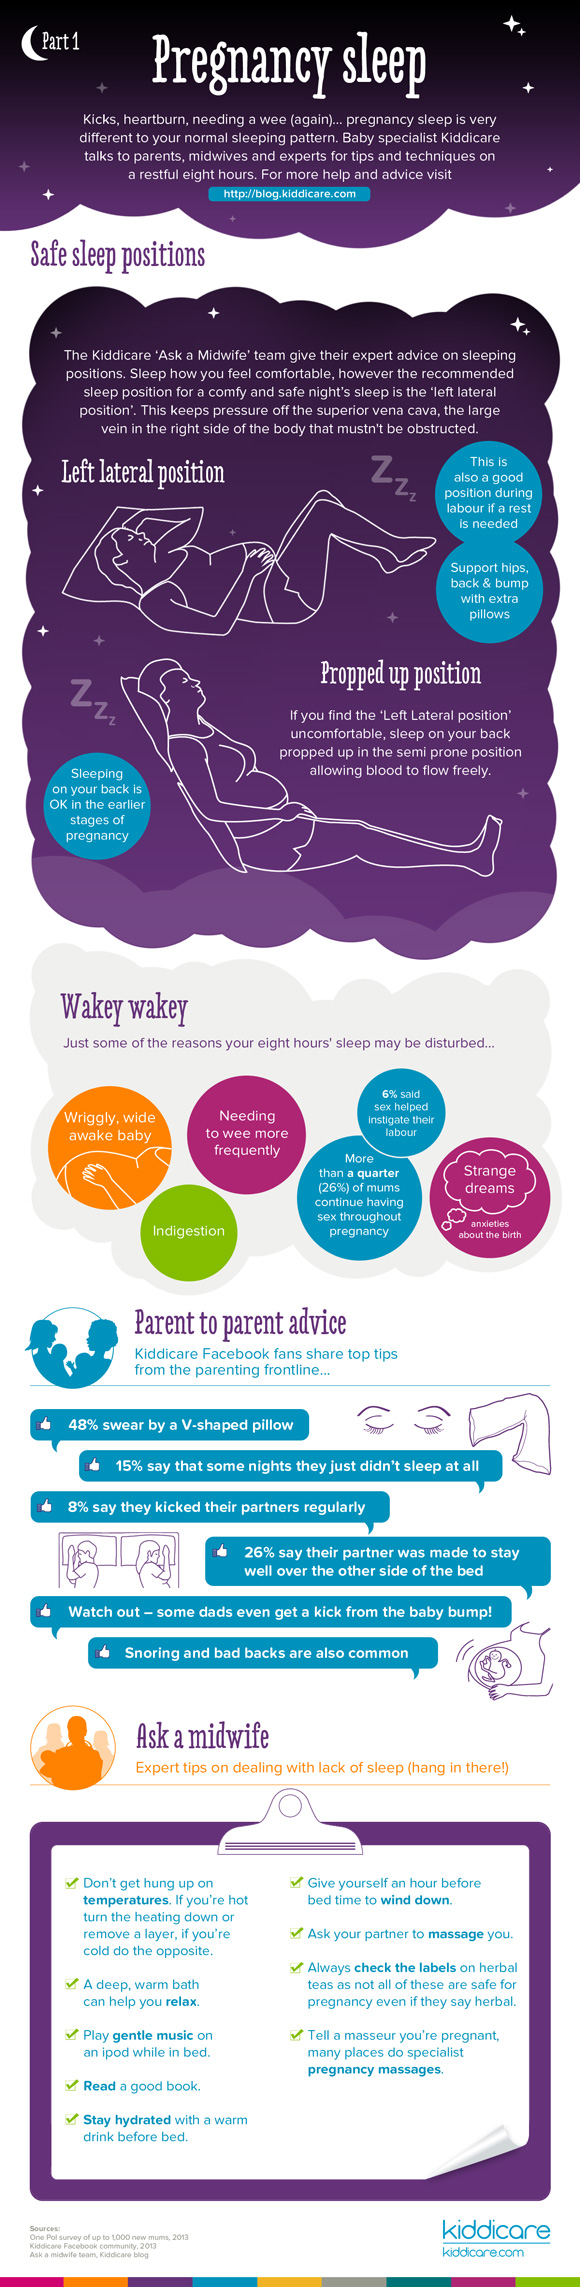 v4.Kiddiecare--Pt1-PregnancySleep